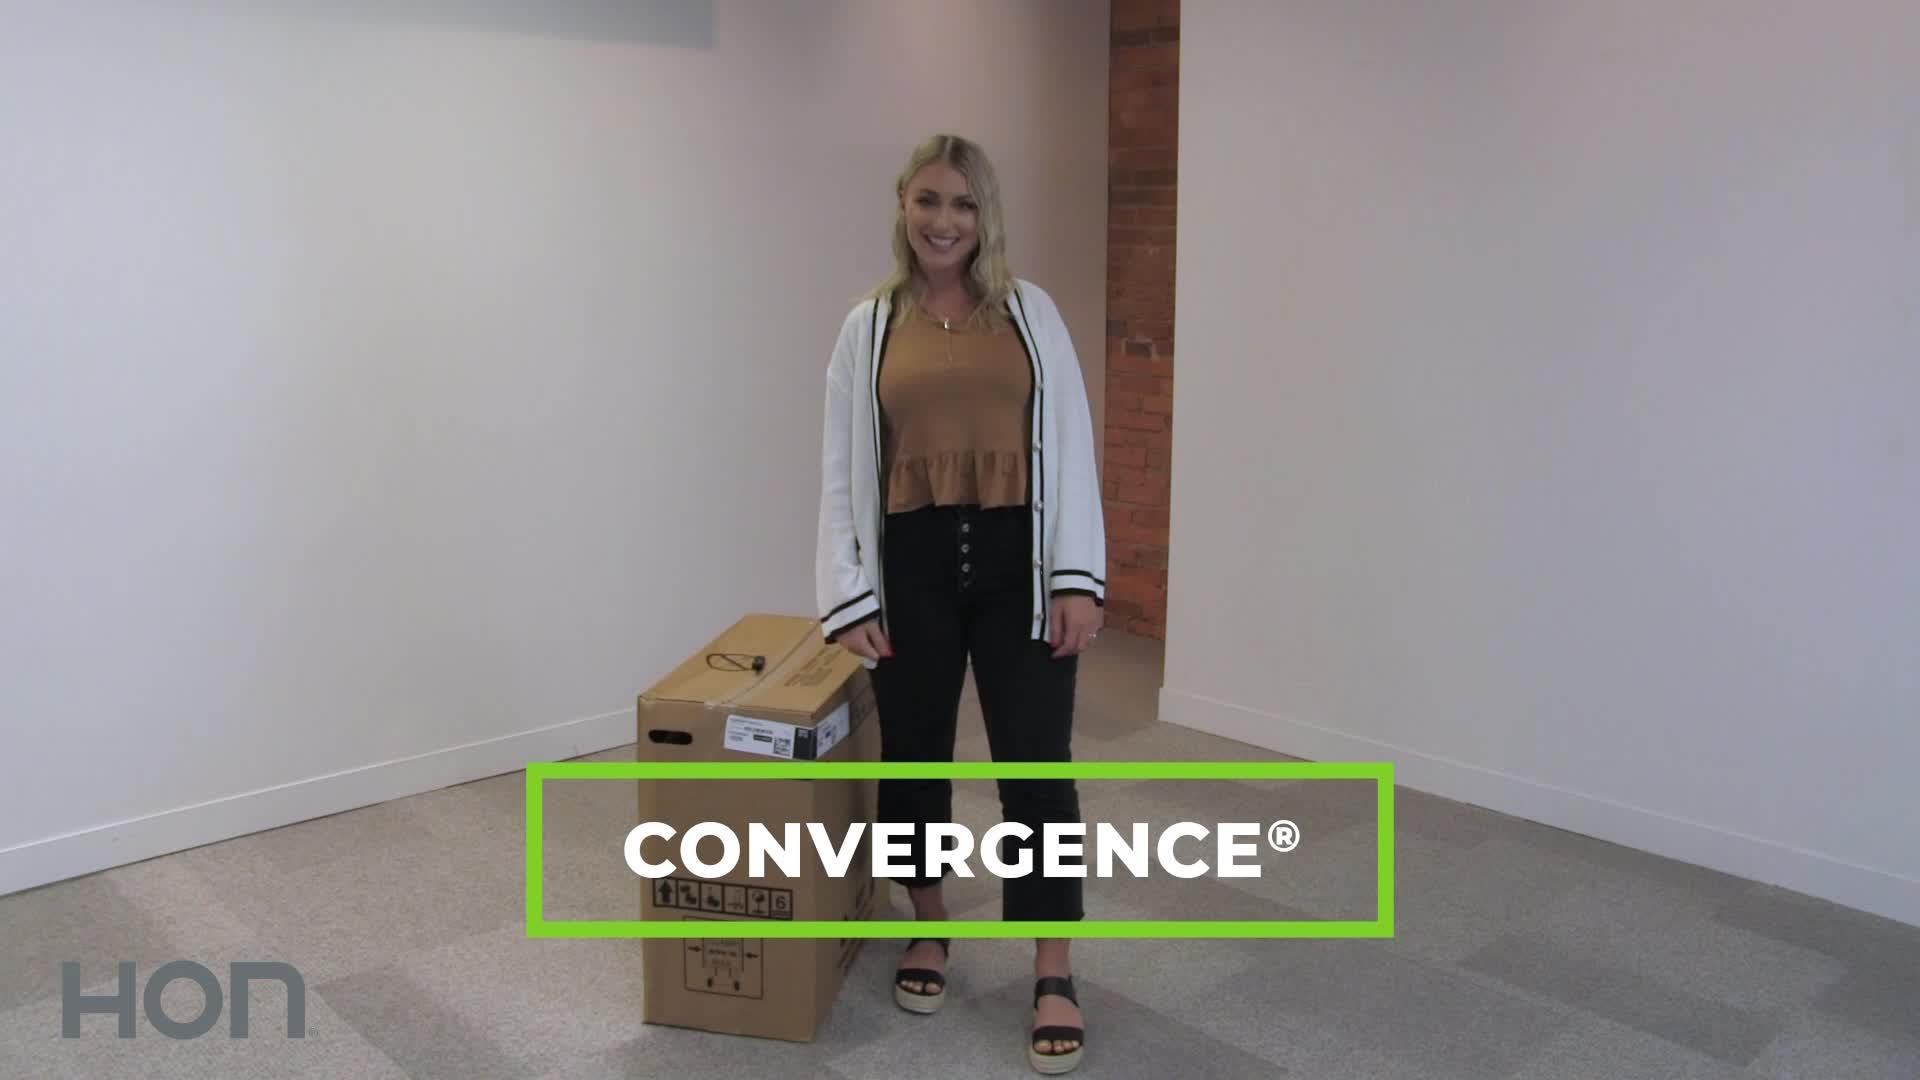 Convergence Installation video link